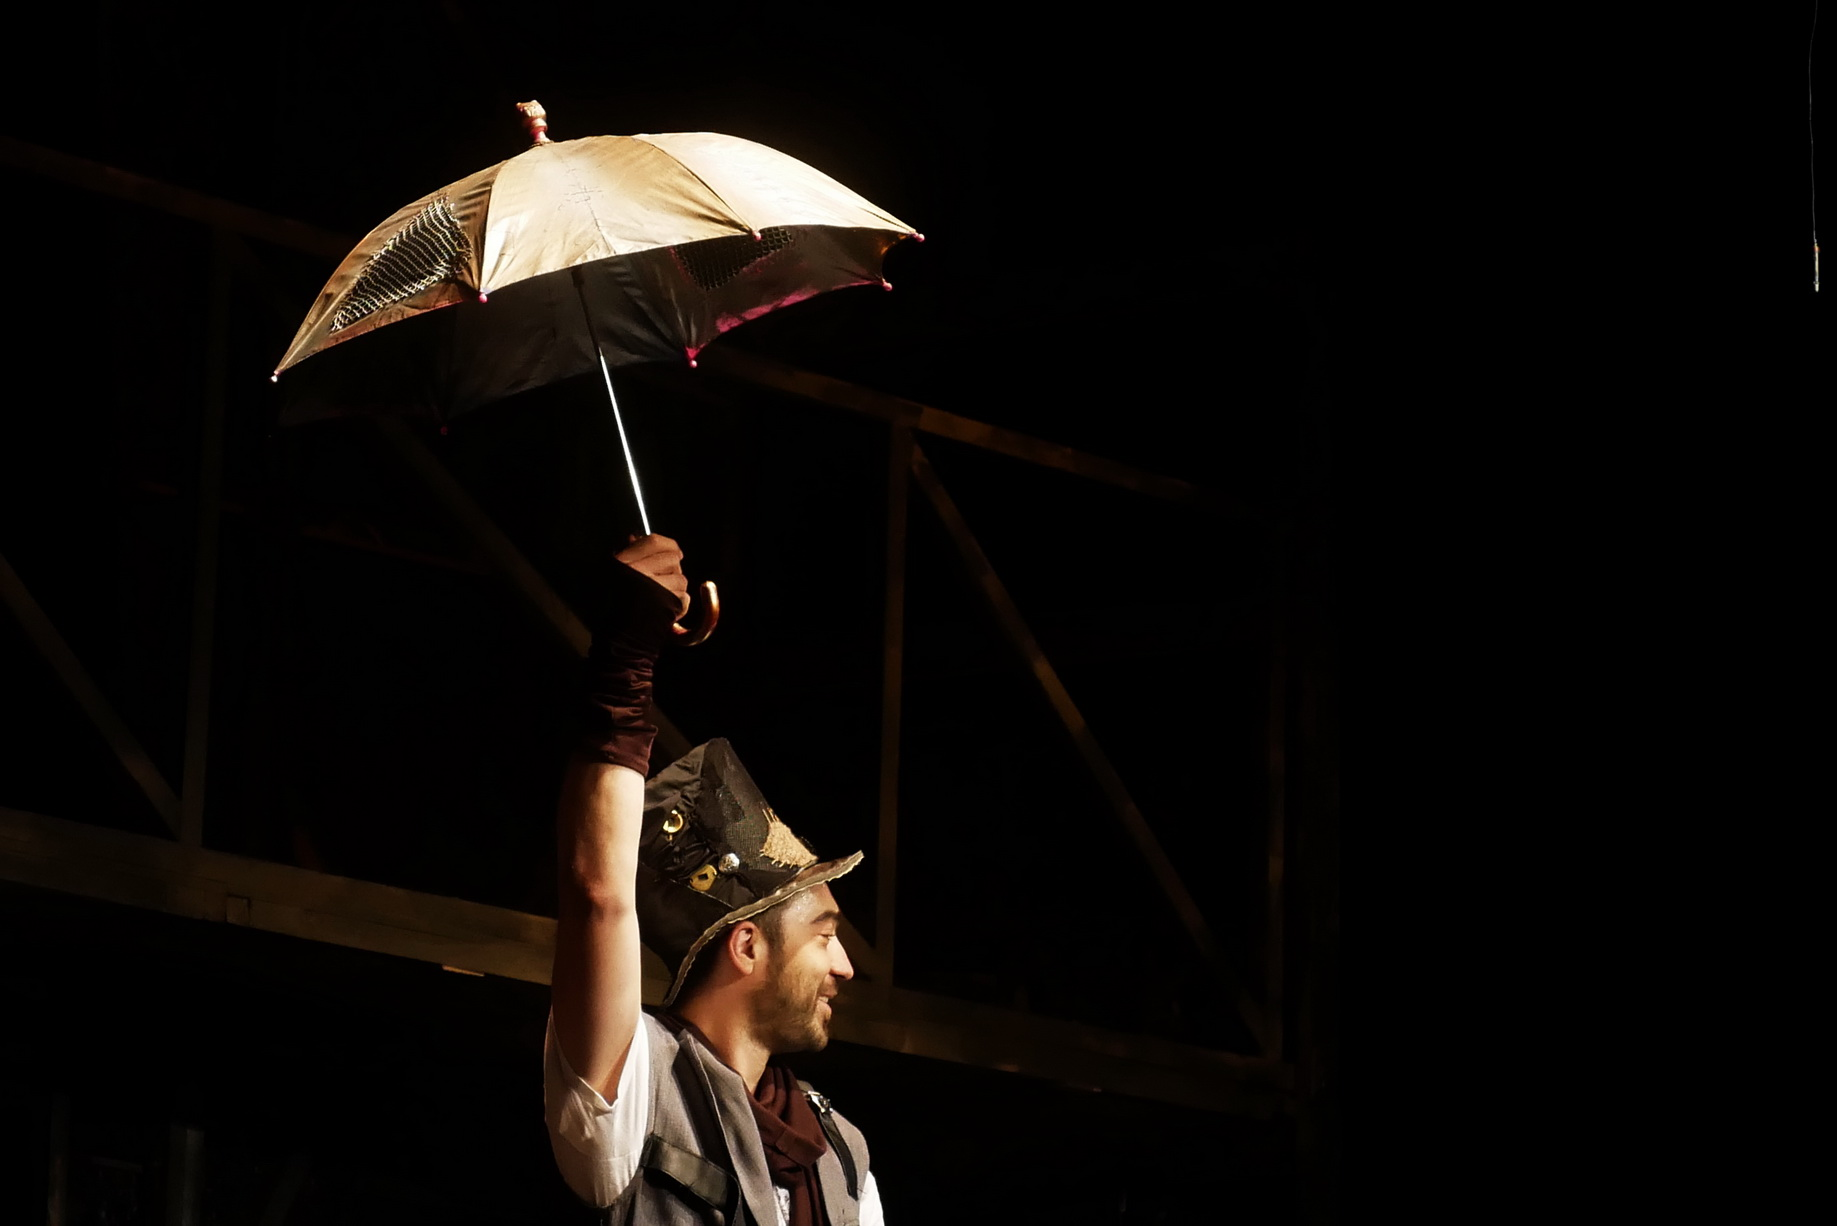 Франківський драмтеатр представив останню прем'єру сезону ''Продавець дощу'' 4